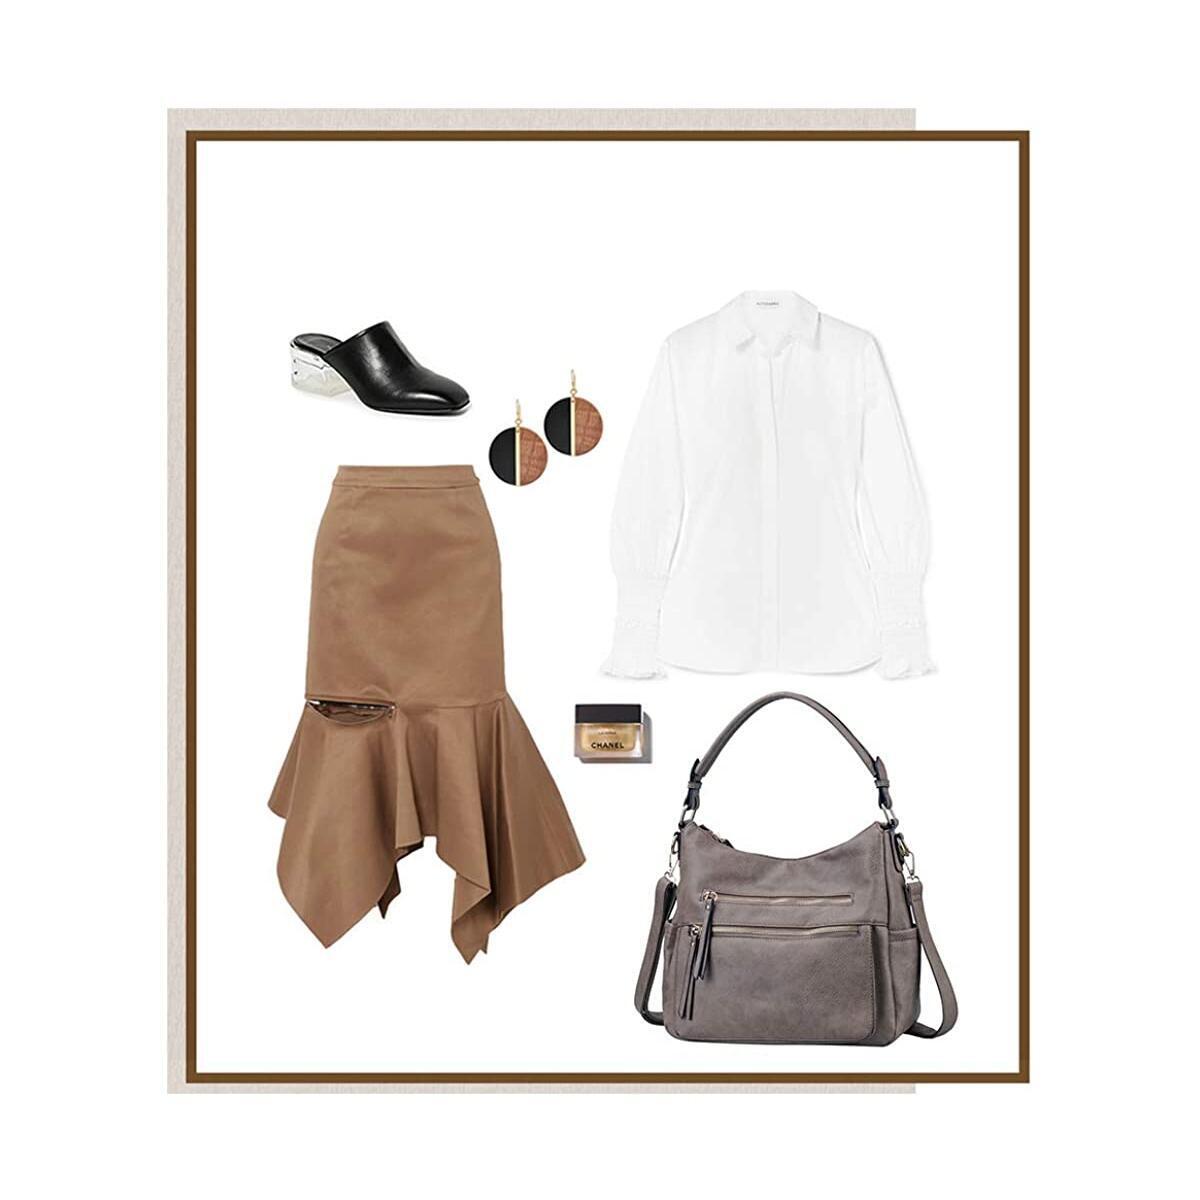 Handbags for Women JOYSON Crossbody Bags PU Leather Hobo Shoulder Bag Multi-pocket Top-Handle Purse